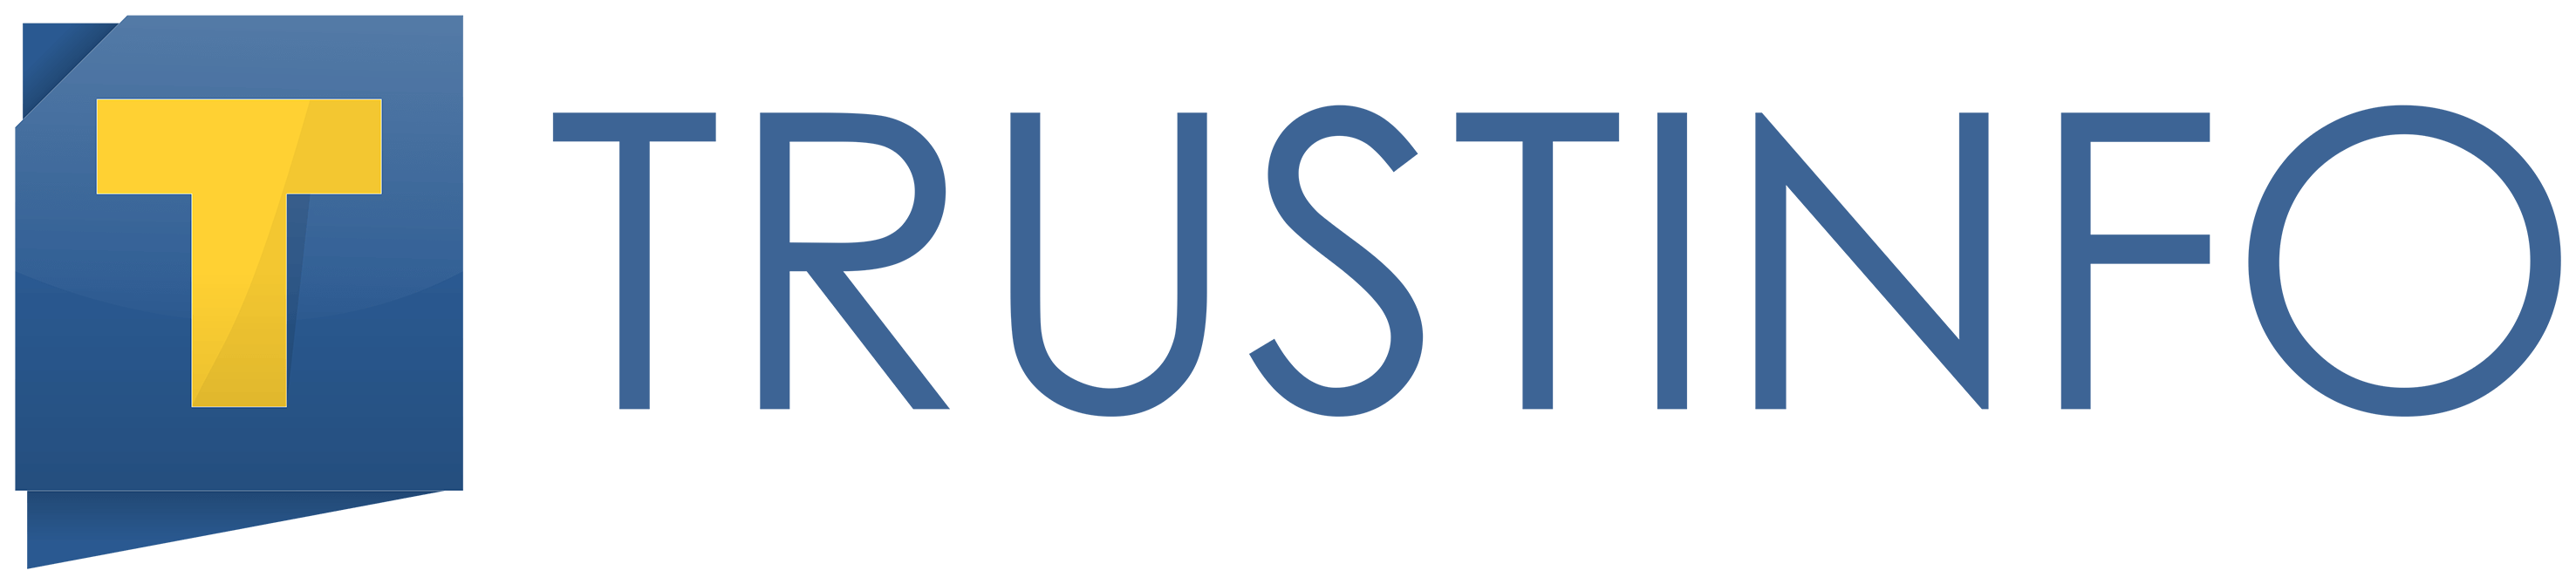 logo de Trustinfo